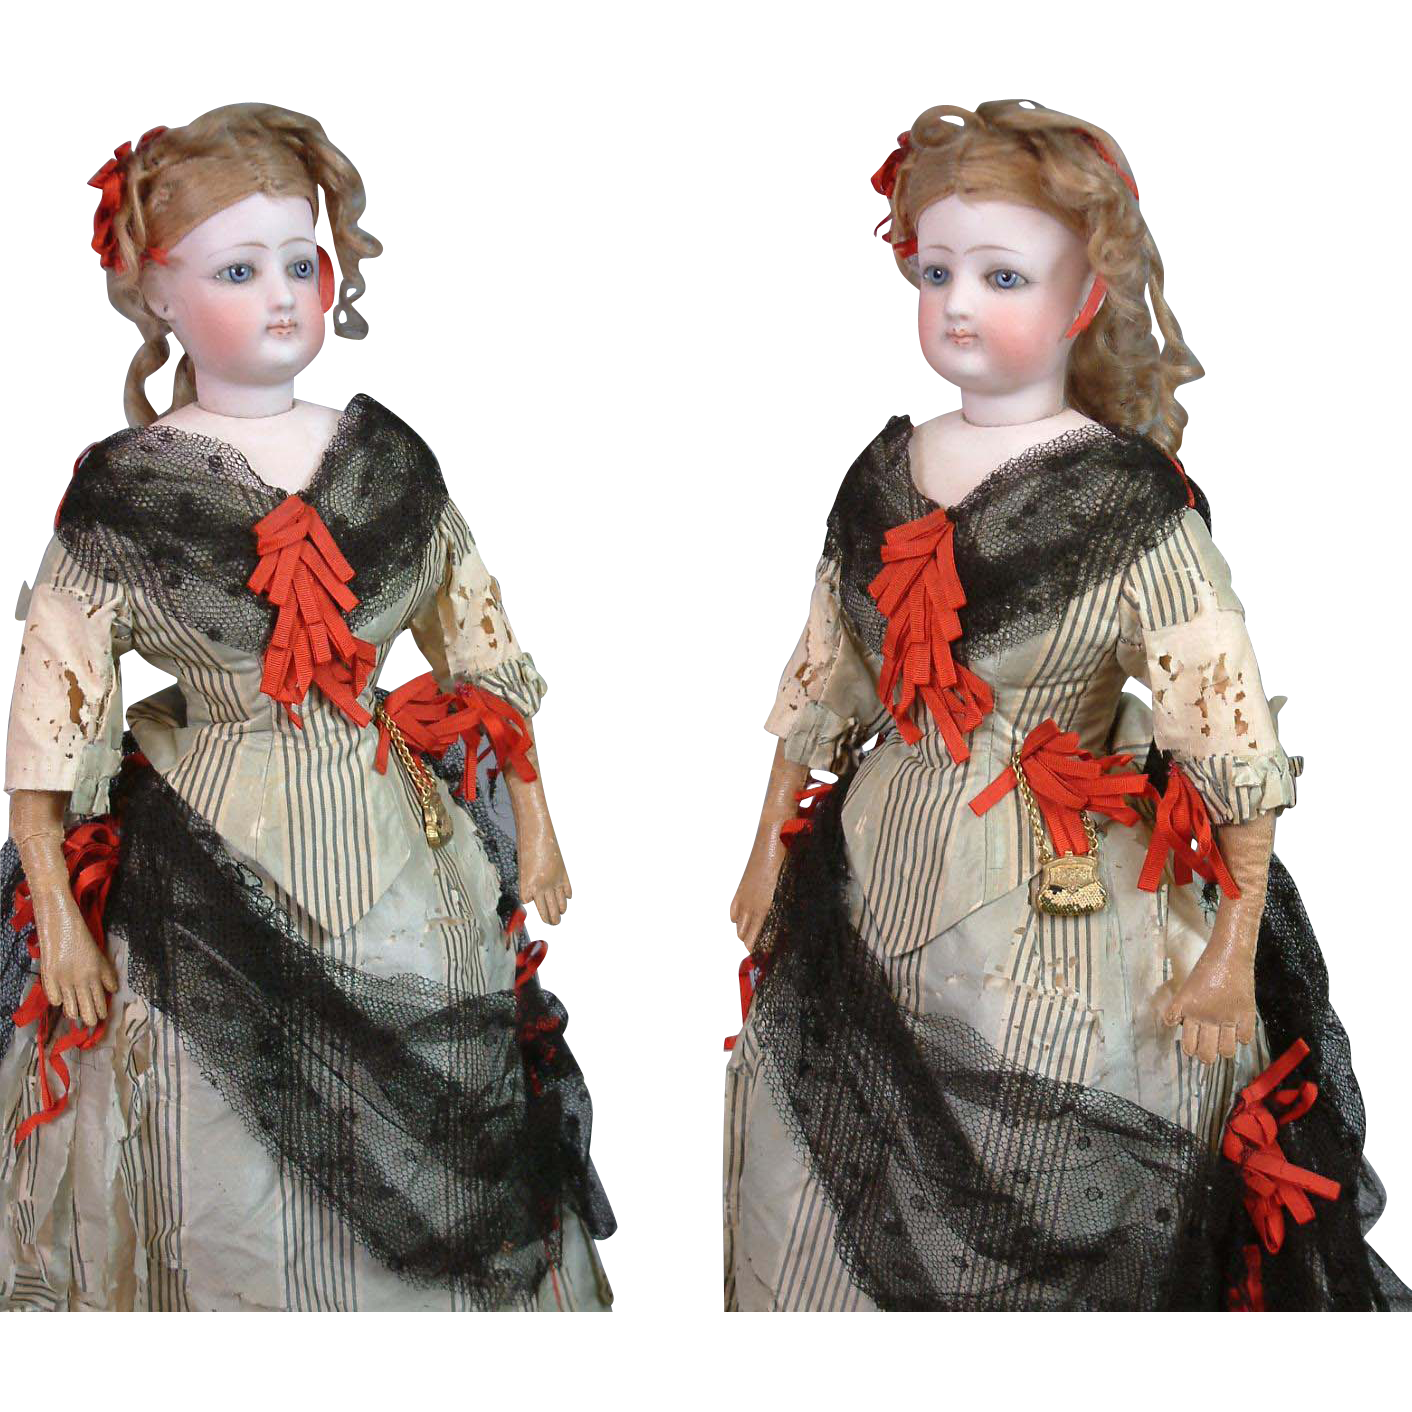 "~Flashsale Friday Fashion Sale~ Superb All Original 17"" Fashion Poupee In Silk Costume With Cloth Body"